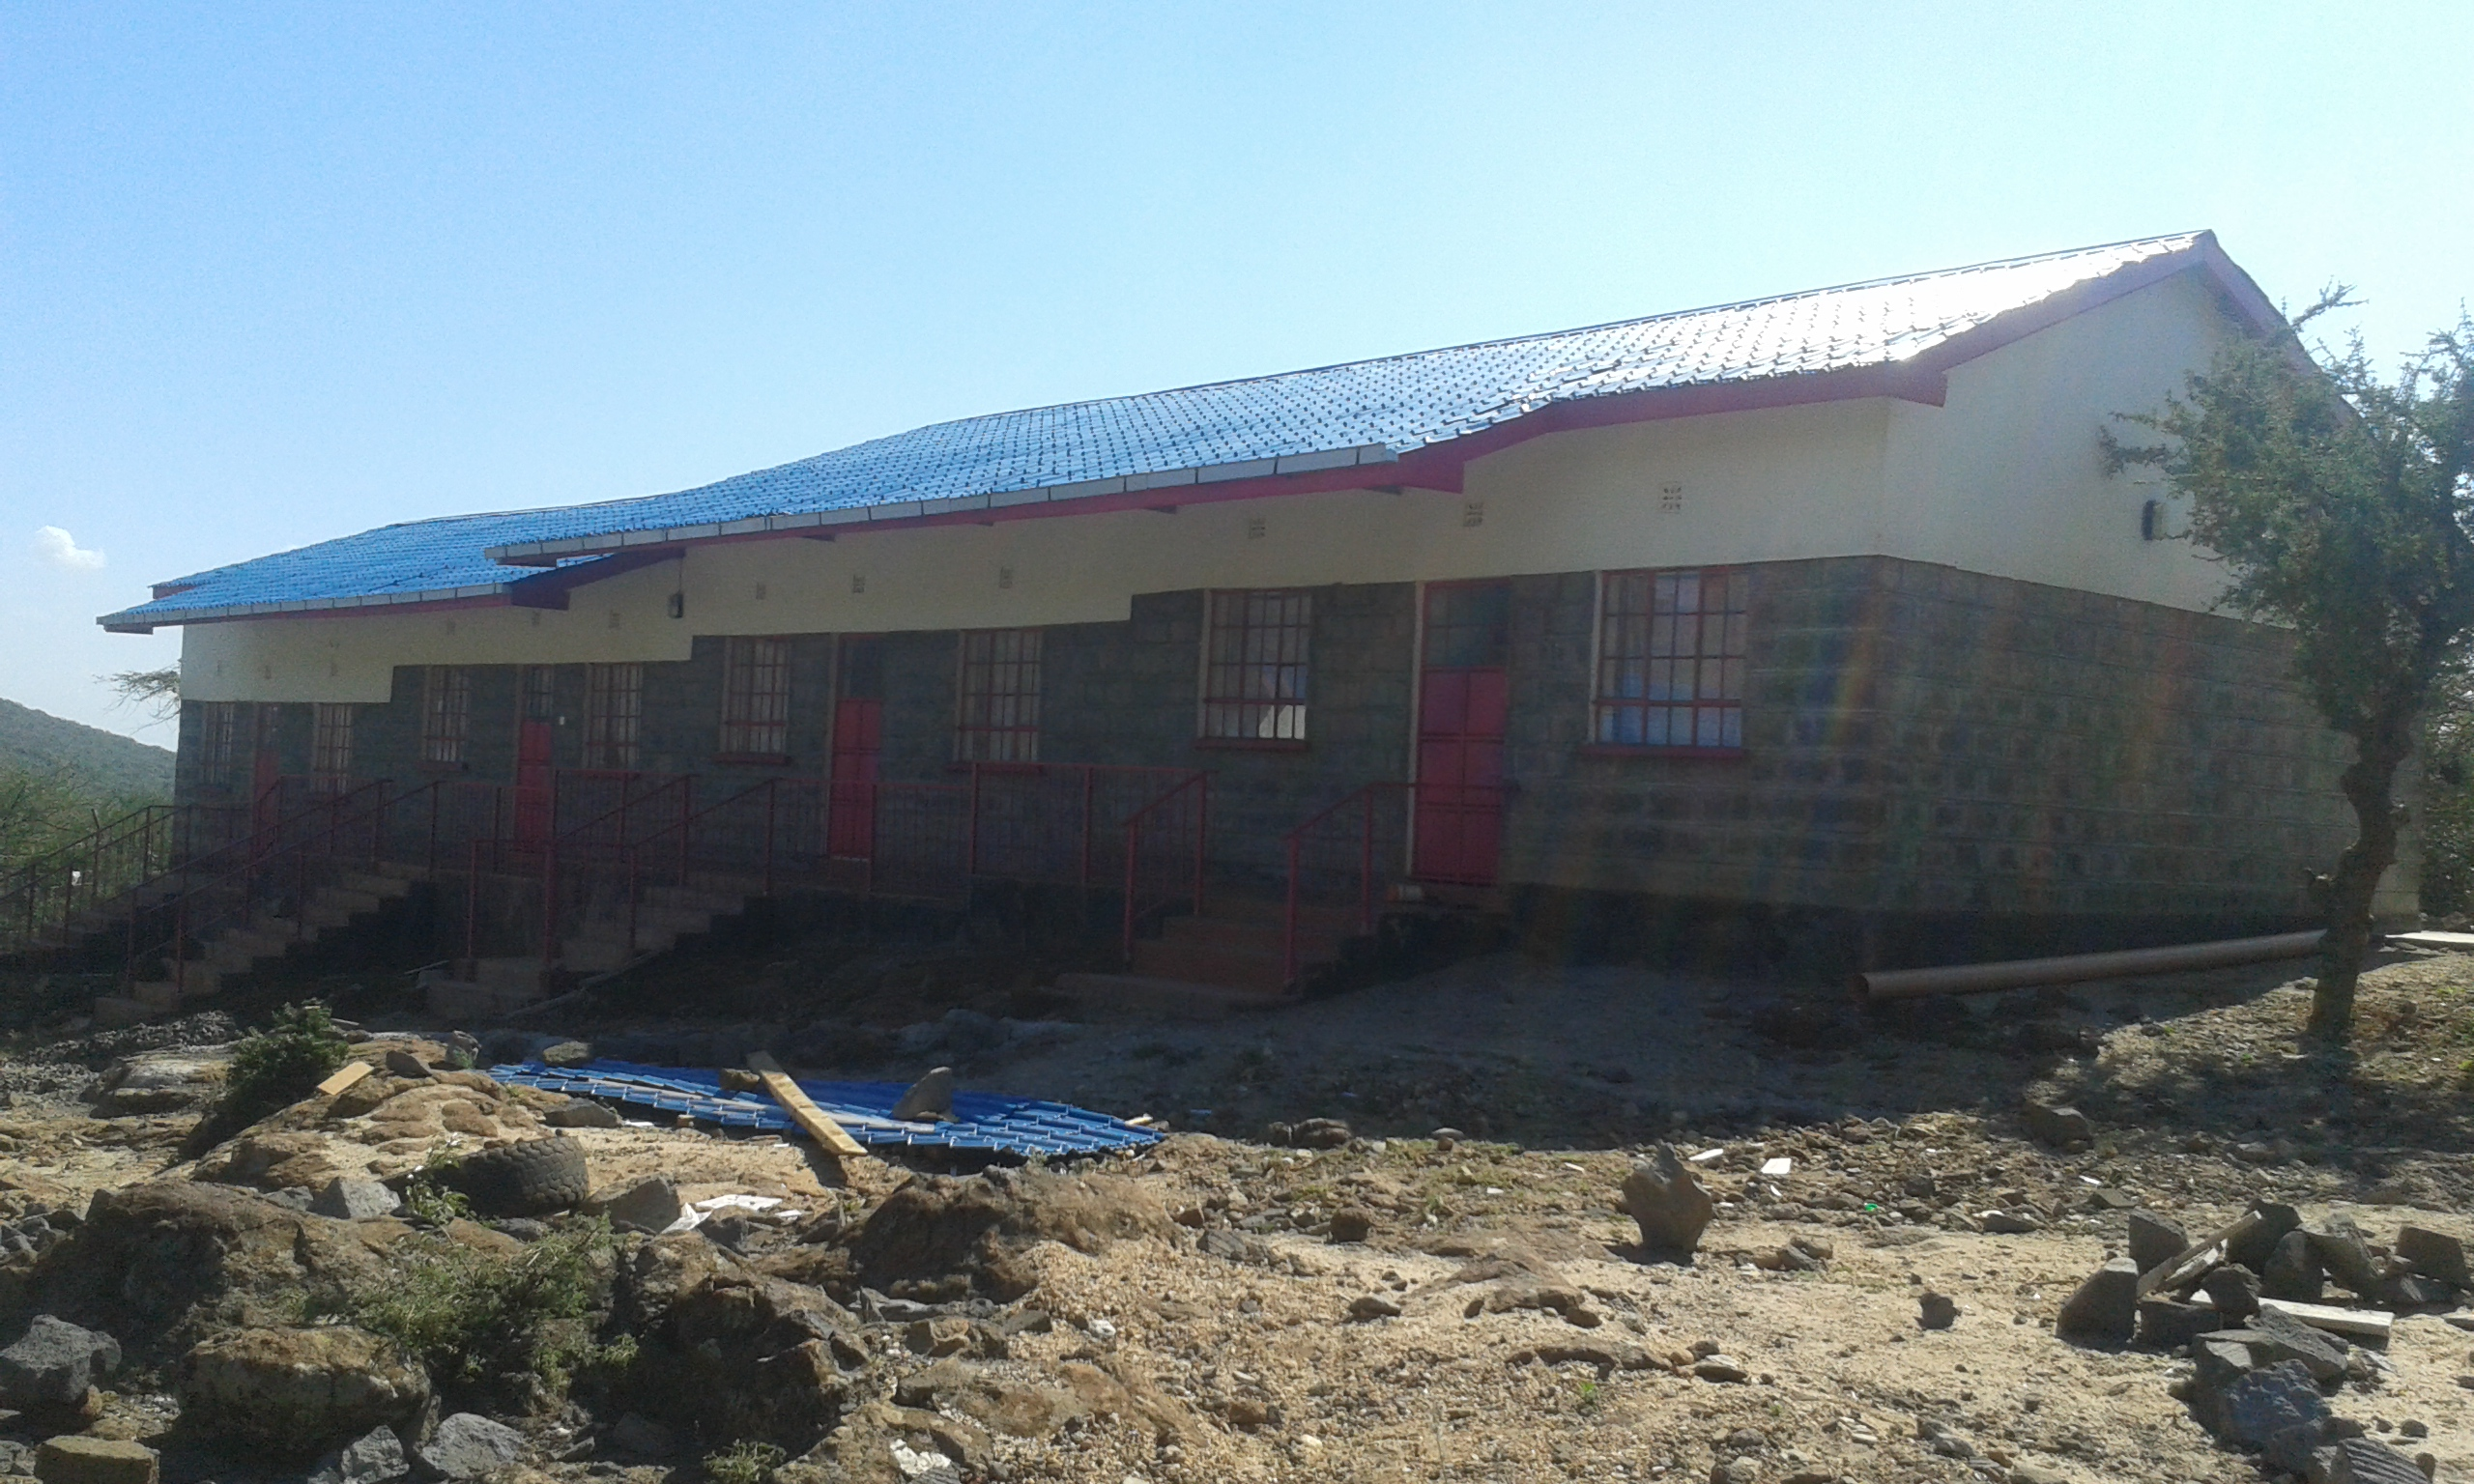 Teachers' House built in 2012